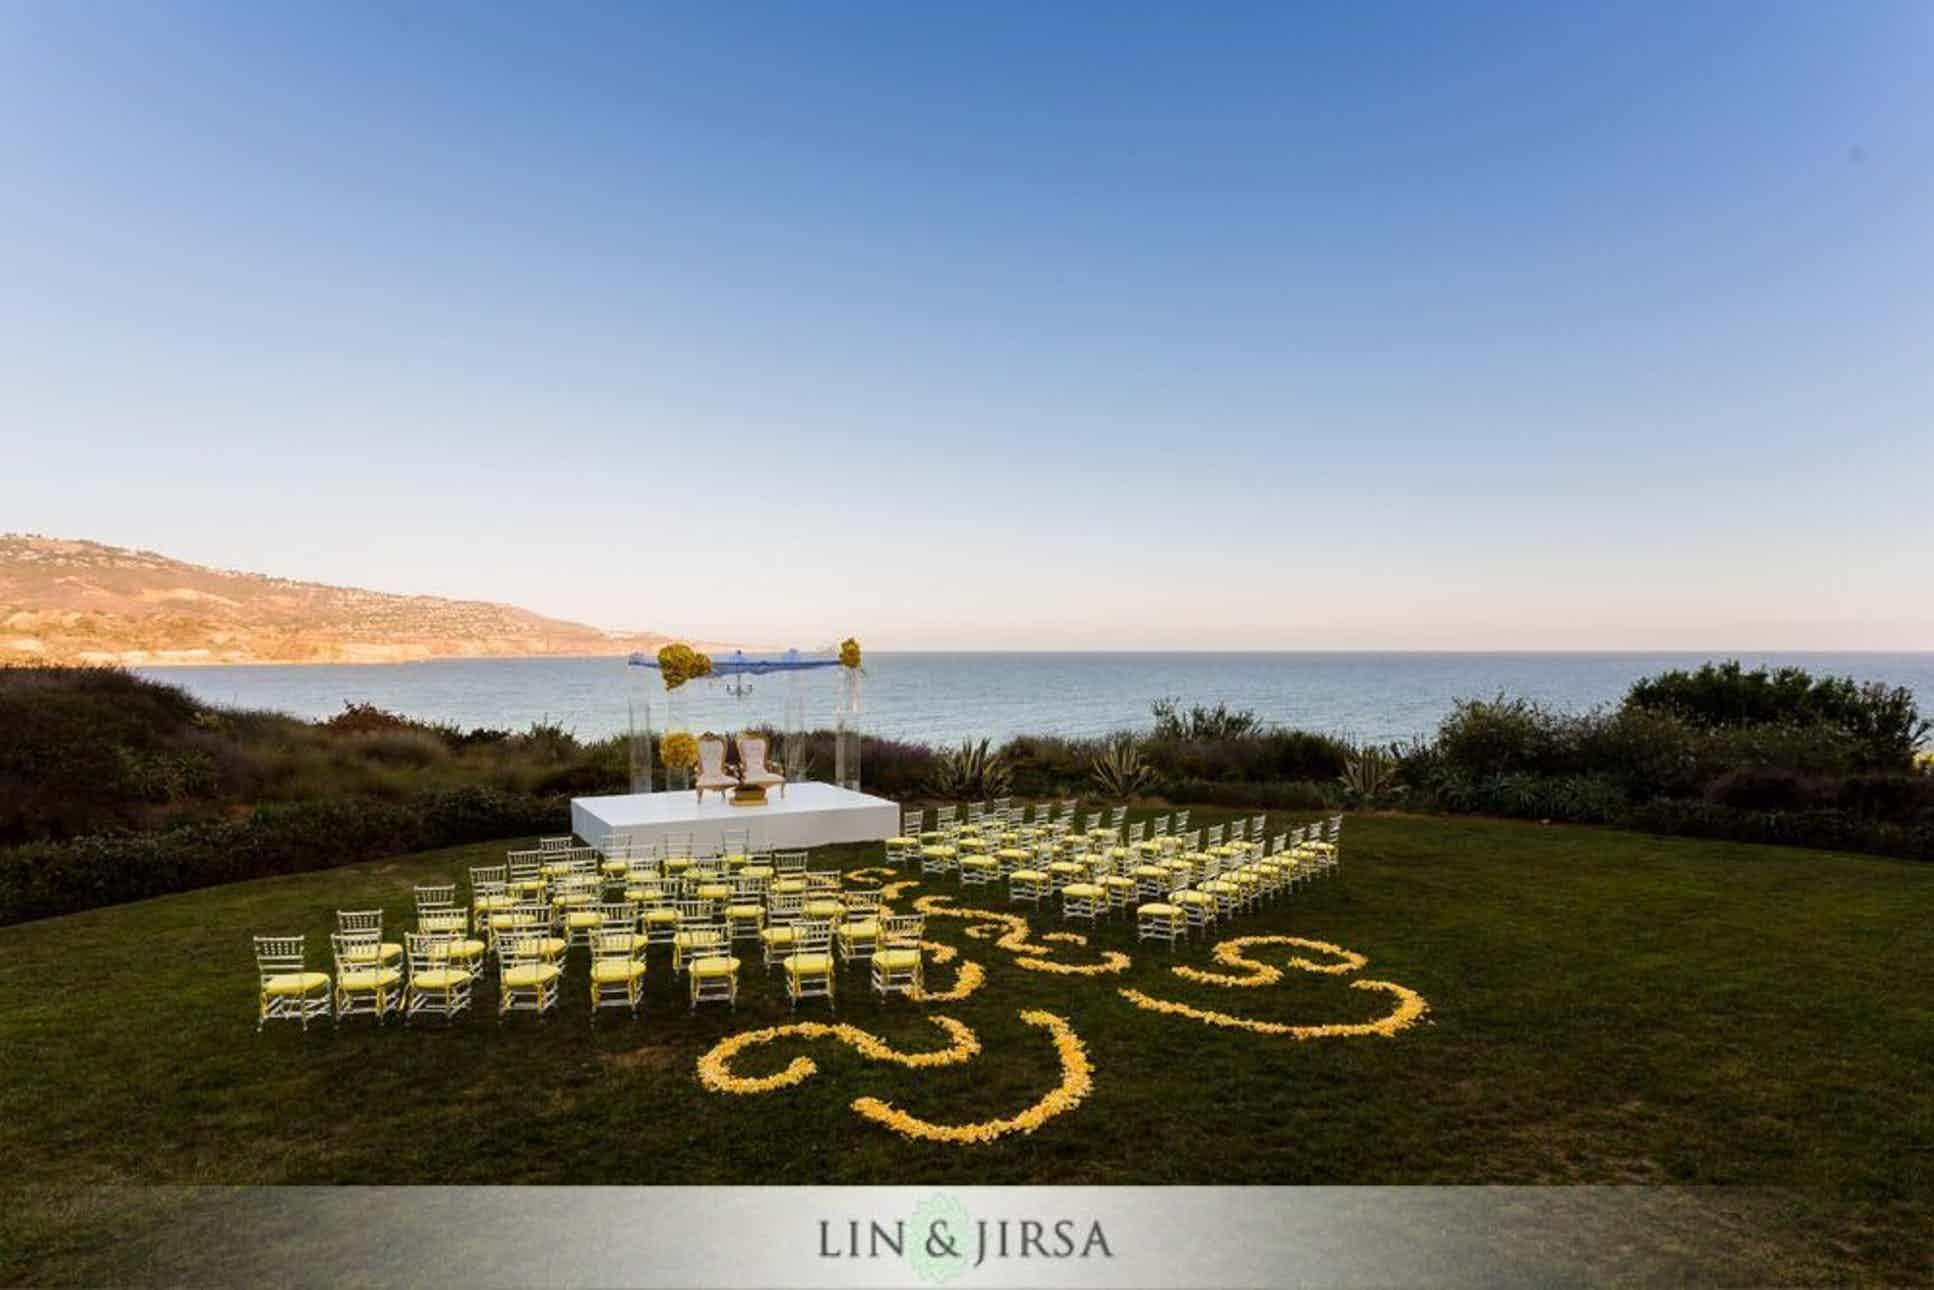 Terranea Resort, Rancho Palos Verdes and other beautiful